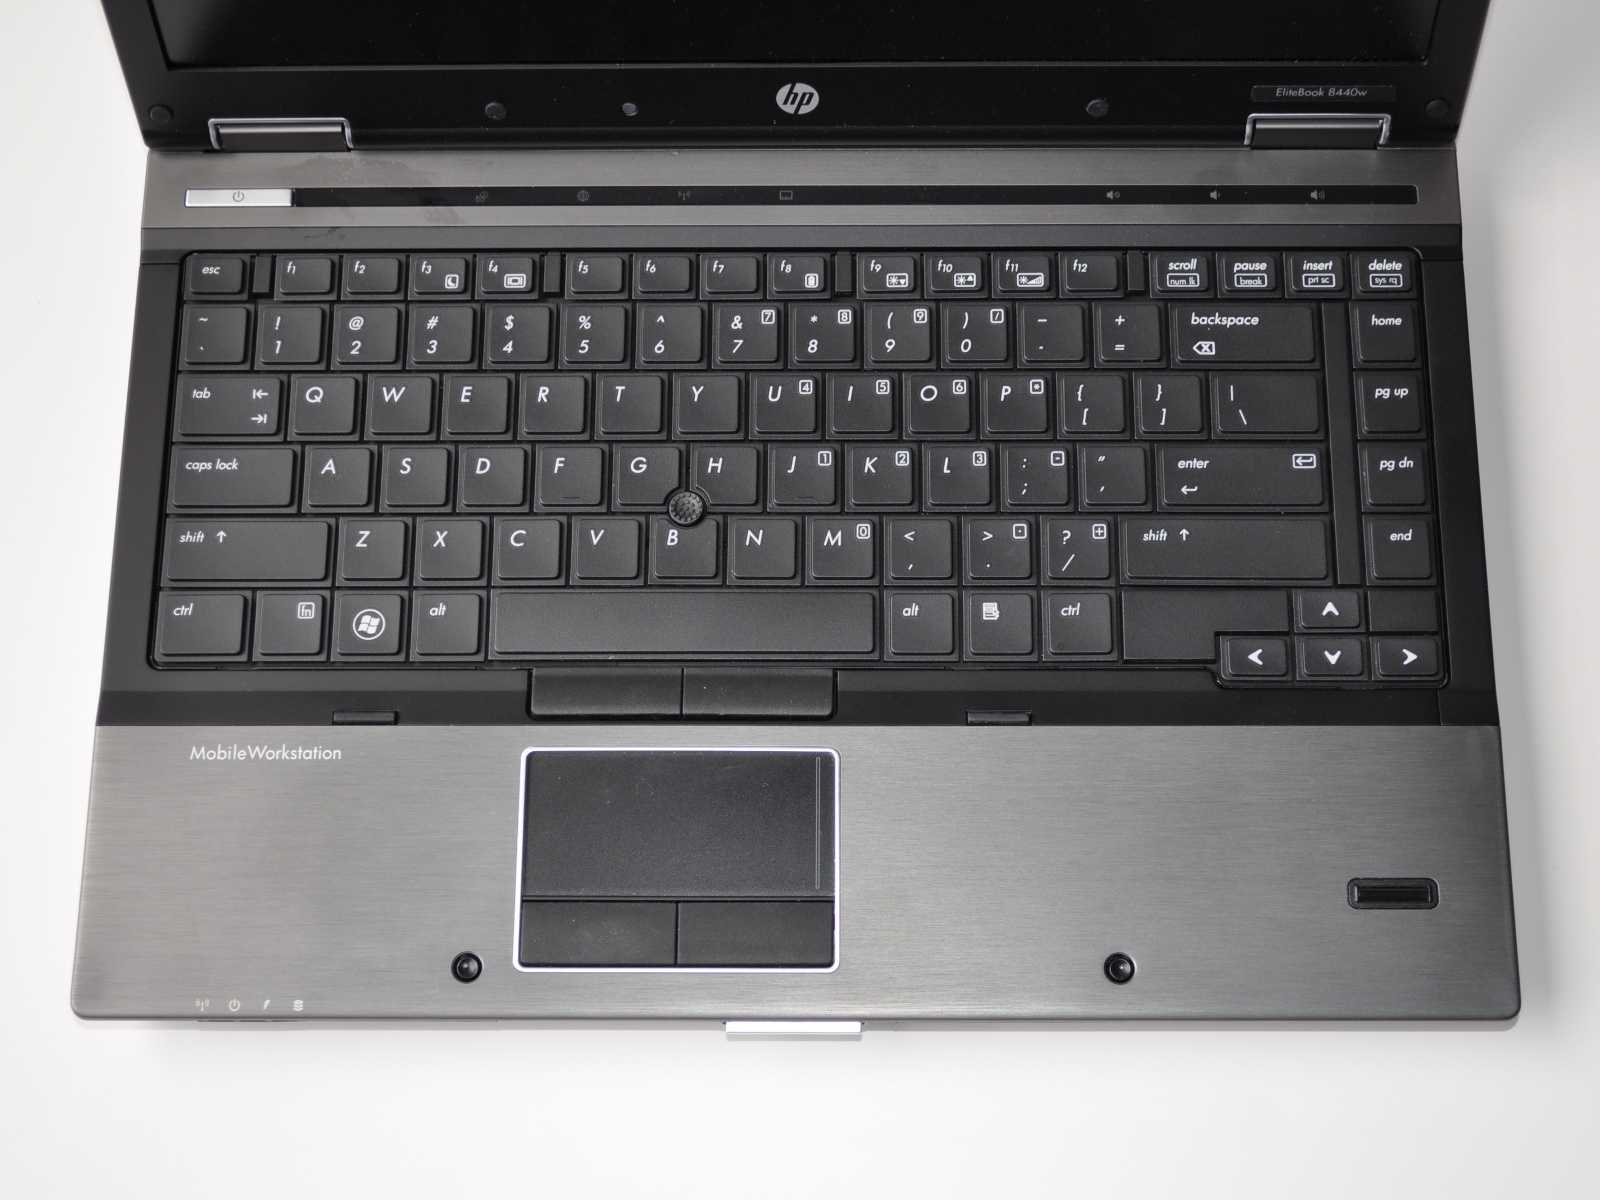 HP EliteBook 8440w - In and Around - HP EliteBook 8440w ...